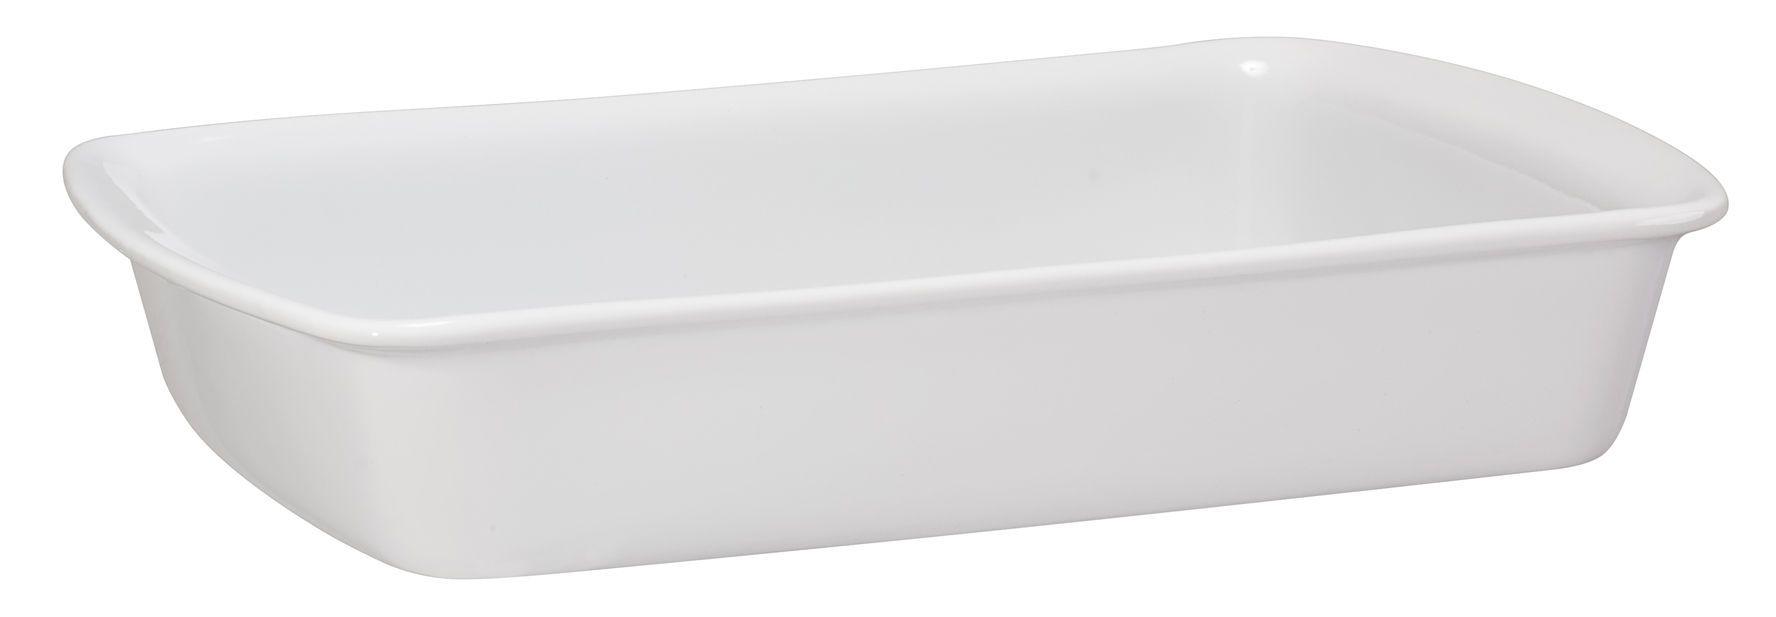 Assadeira Retangular 30x19cm Cerâmica Branca